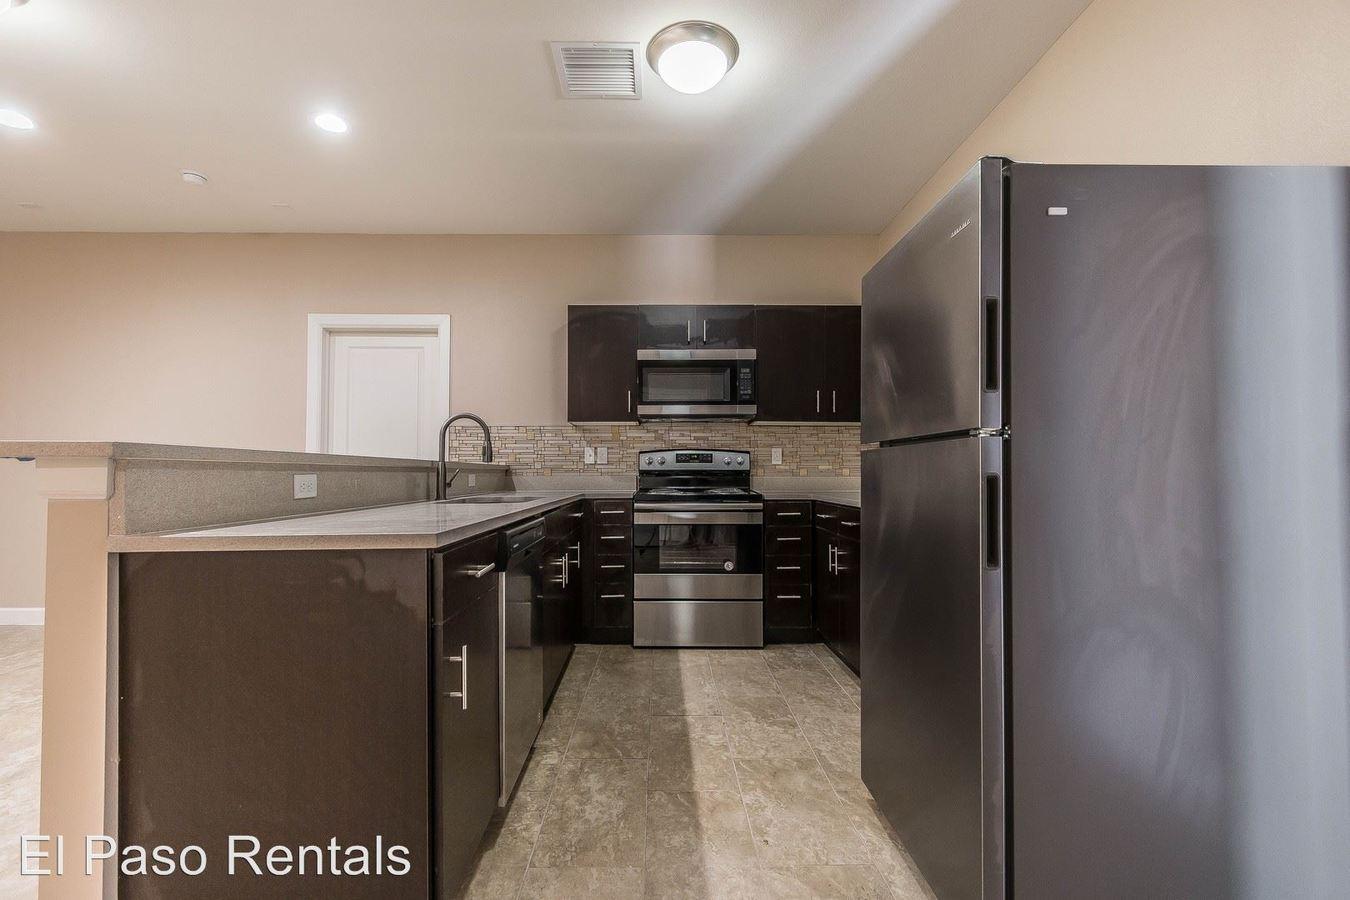 3 Bedrooms 2 Bathrooms Apartment for rent at 1551 N. Stanton Street in El Paso, TX